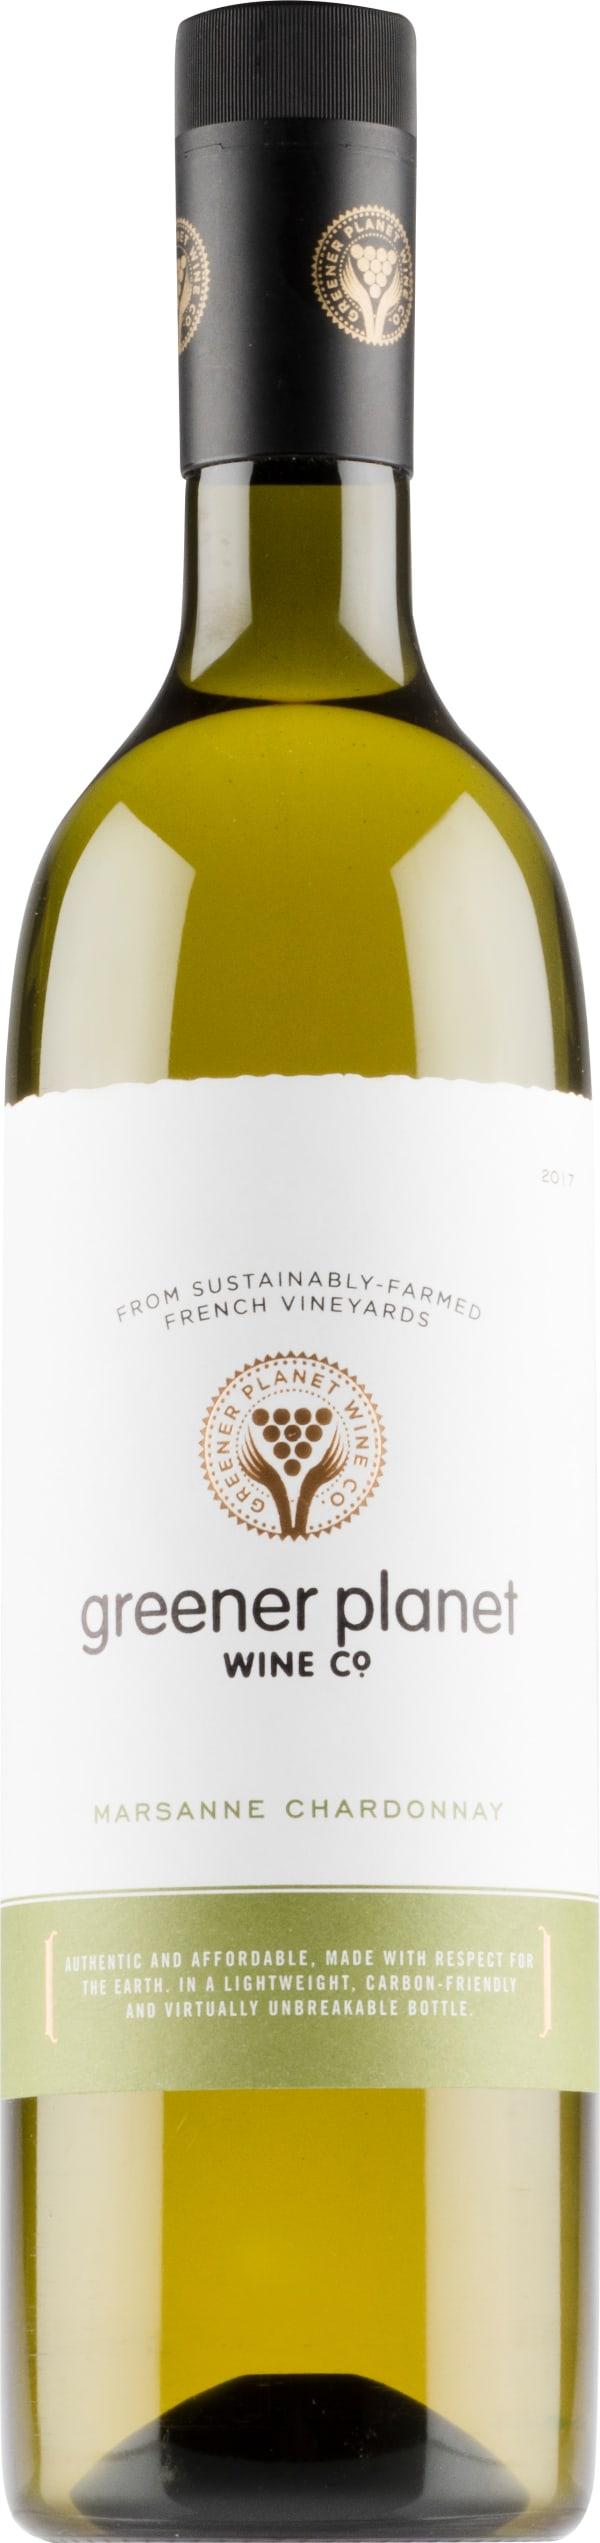 Greener Planet Marsanne Chardonnay 2019 plastflaska